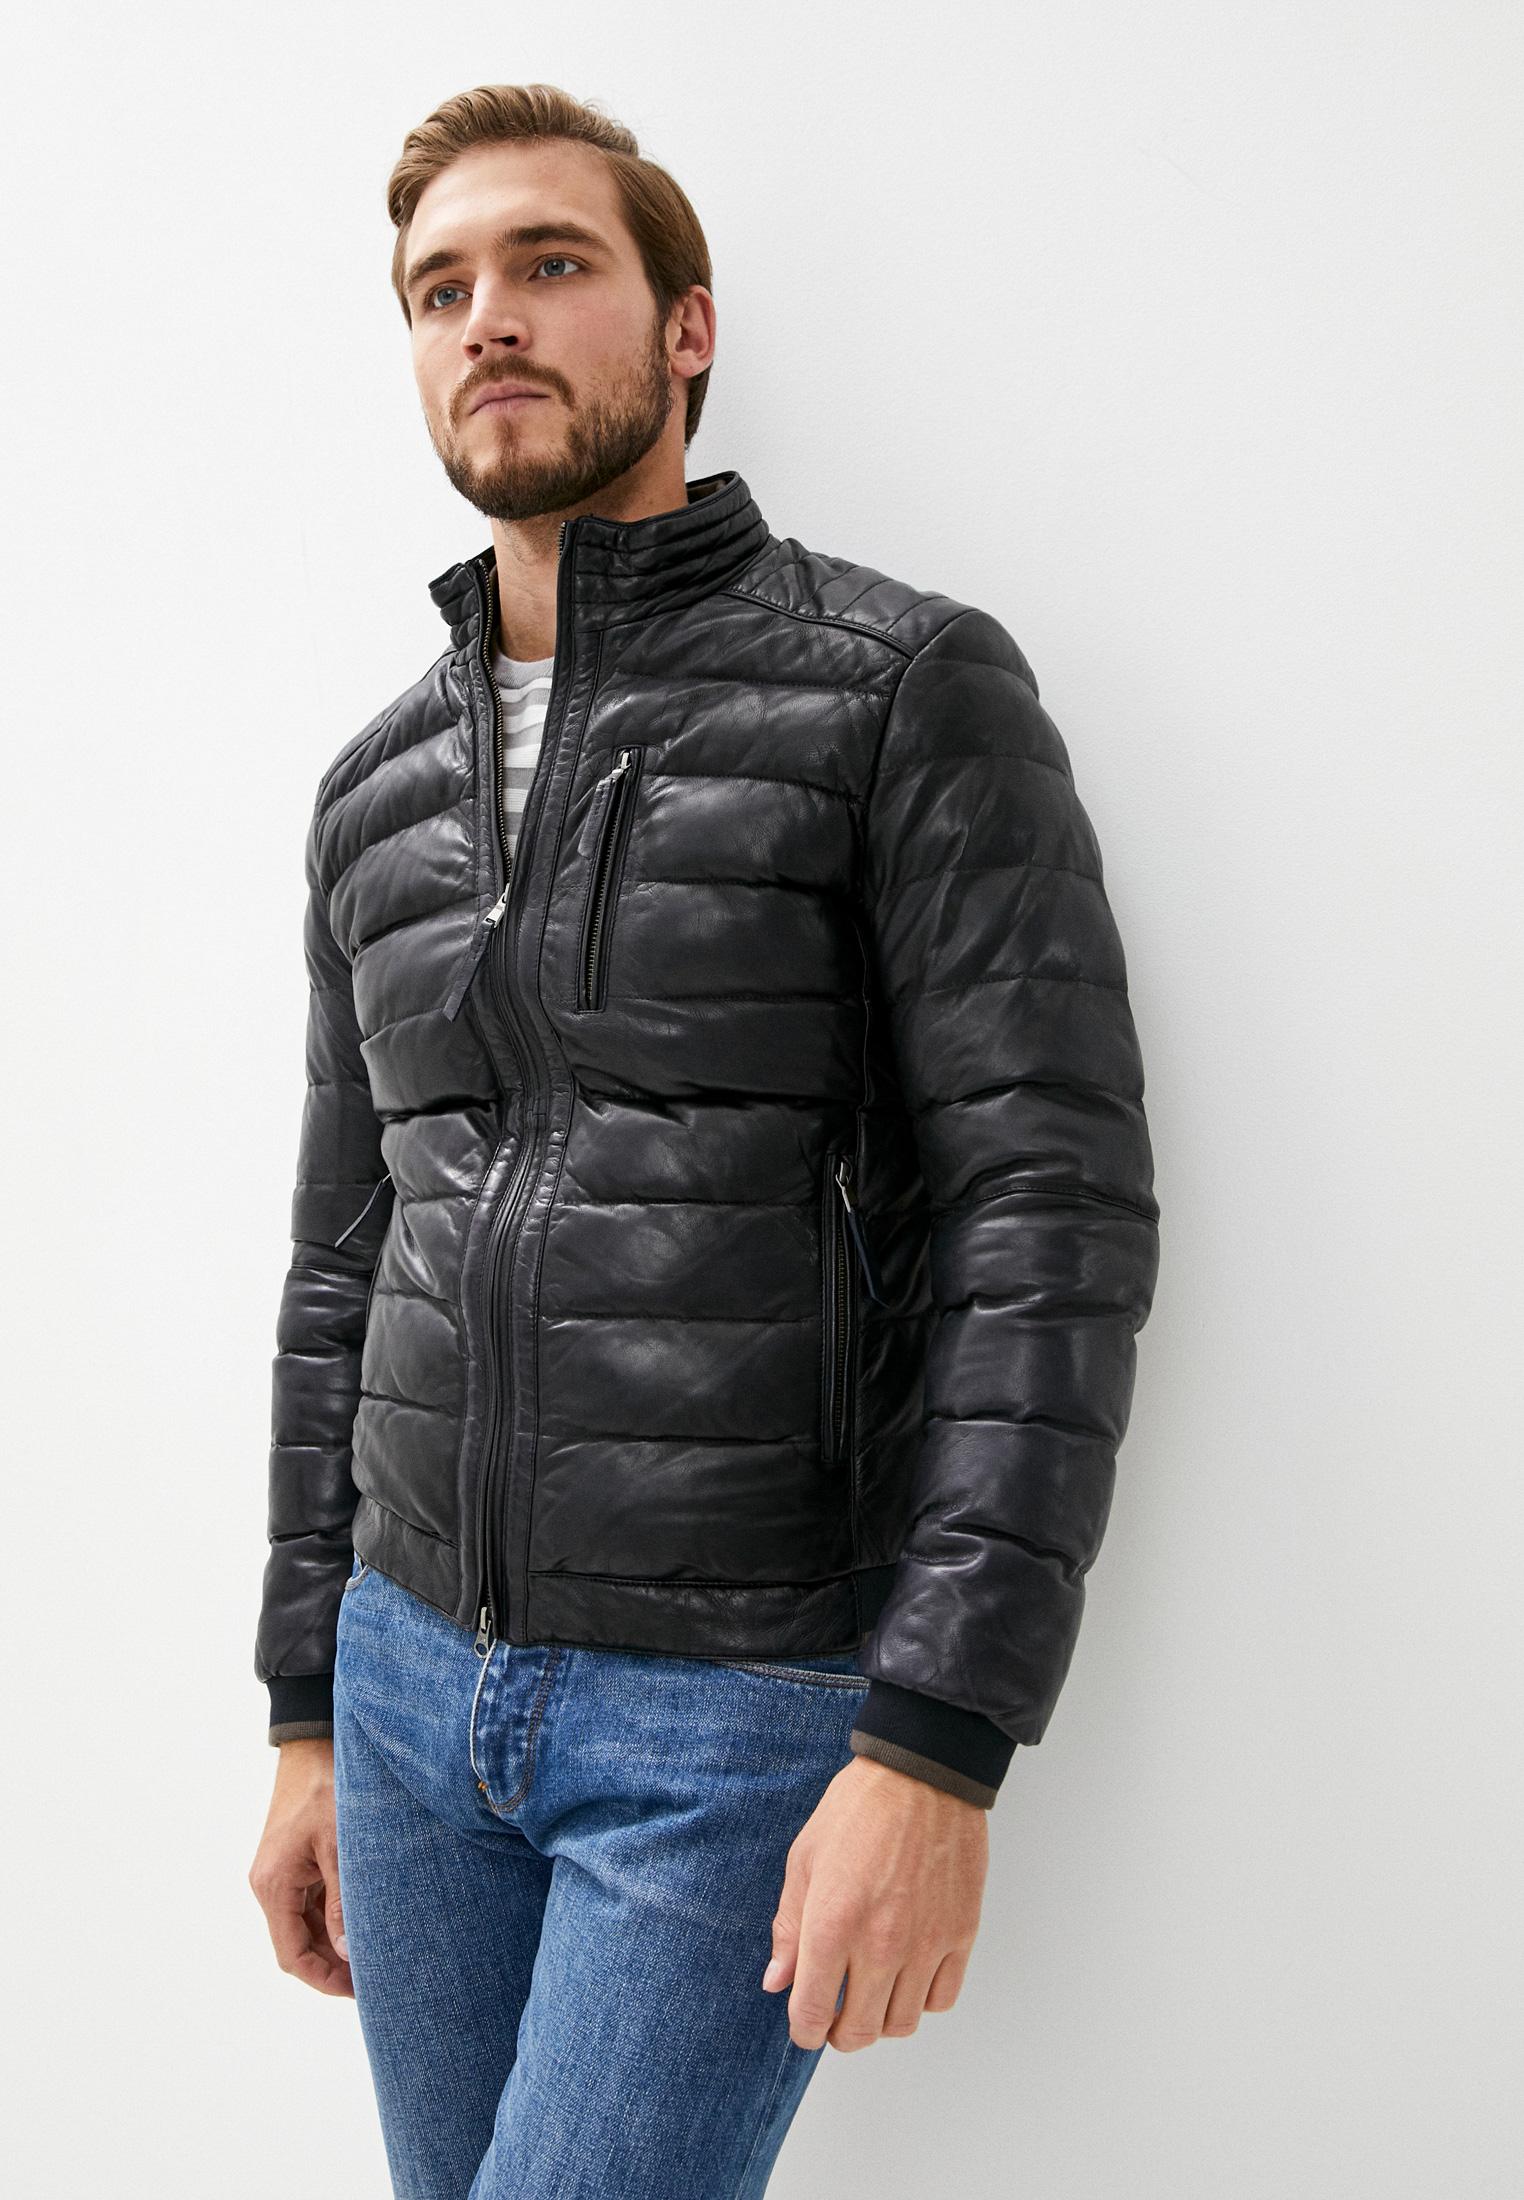 Кожаная куртка Blouson 603nappa paris